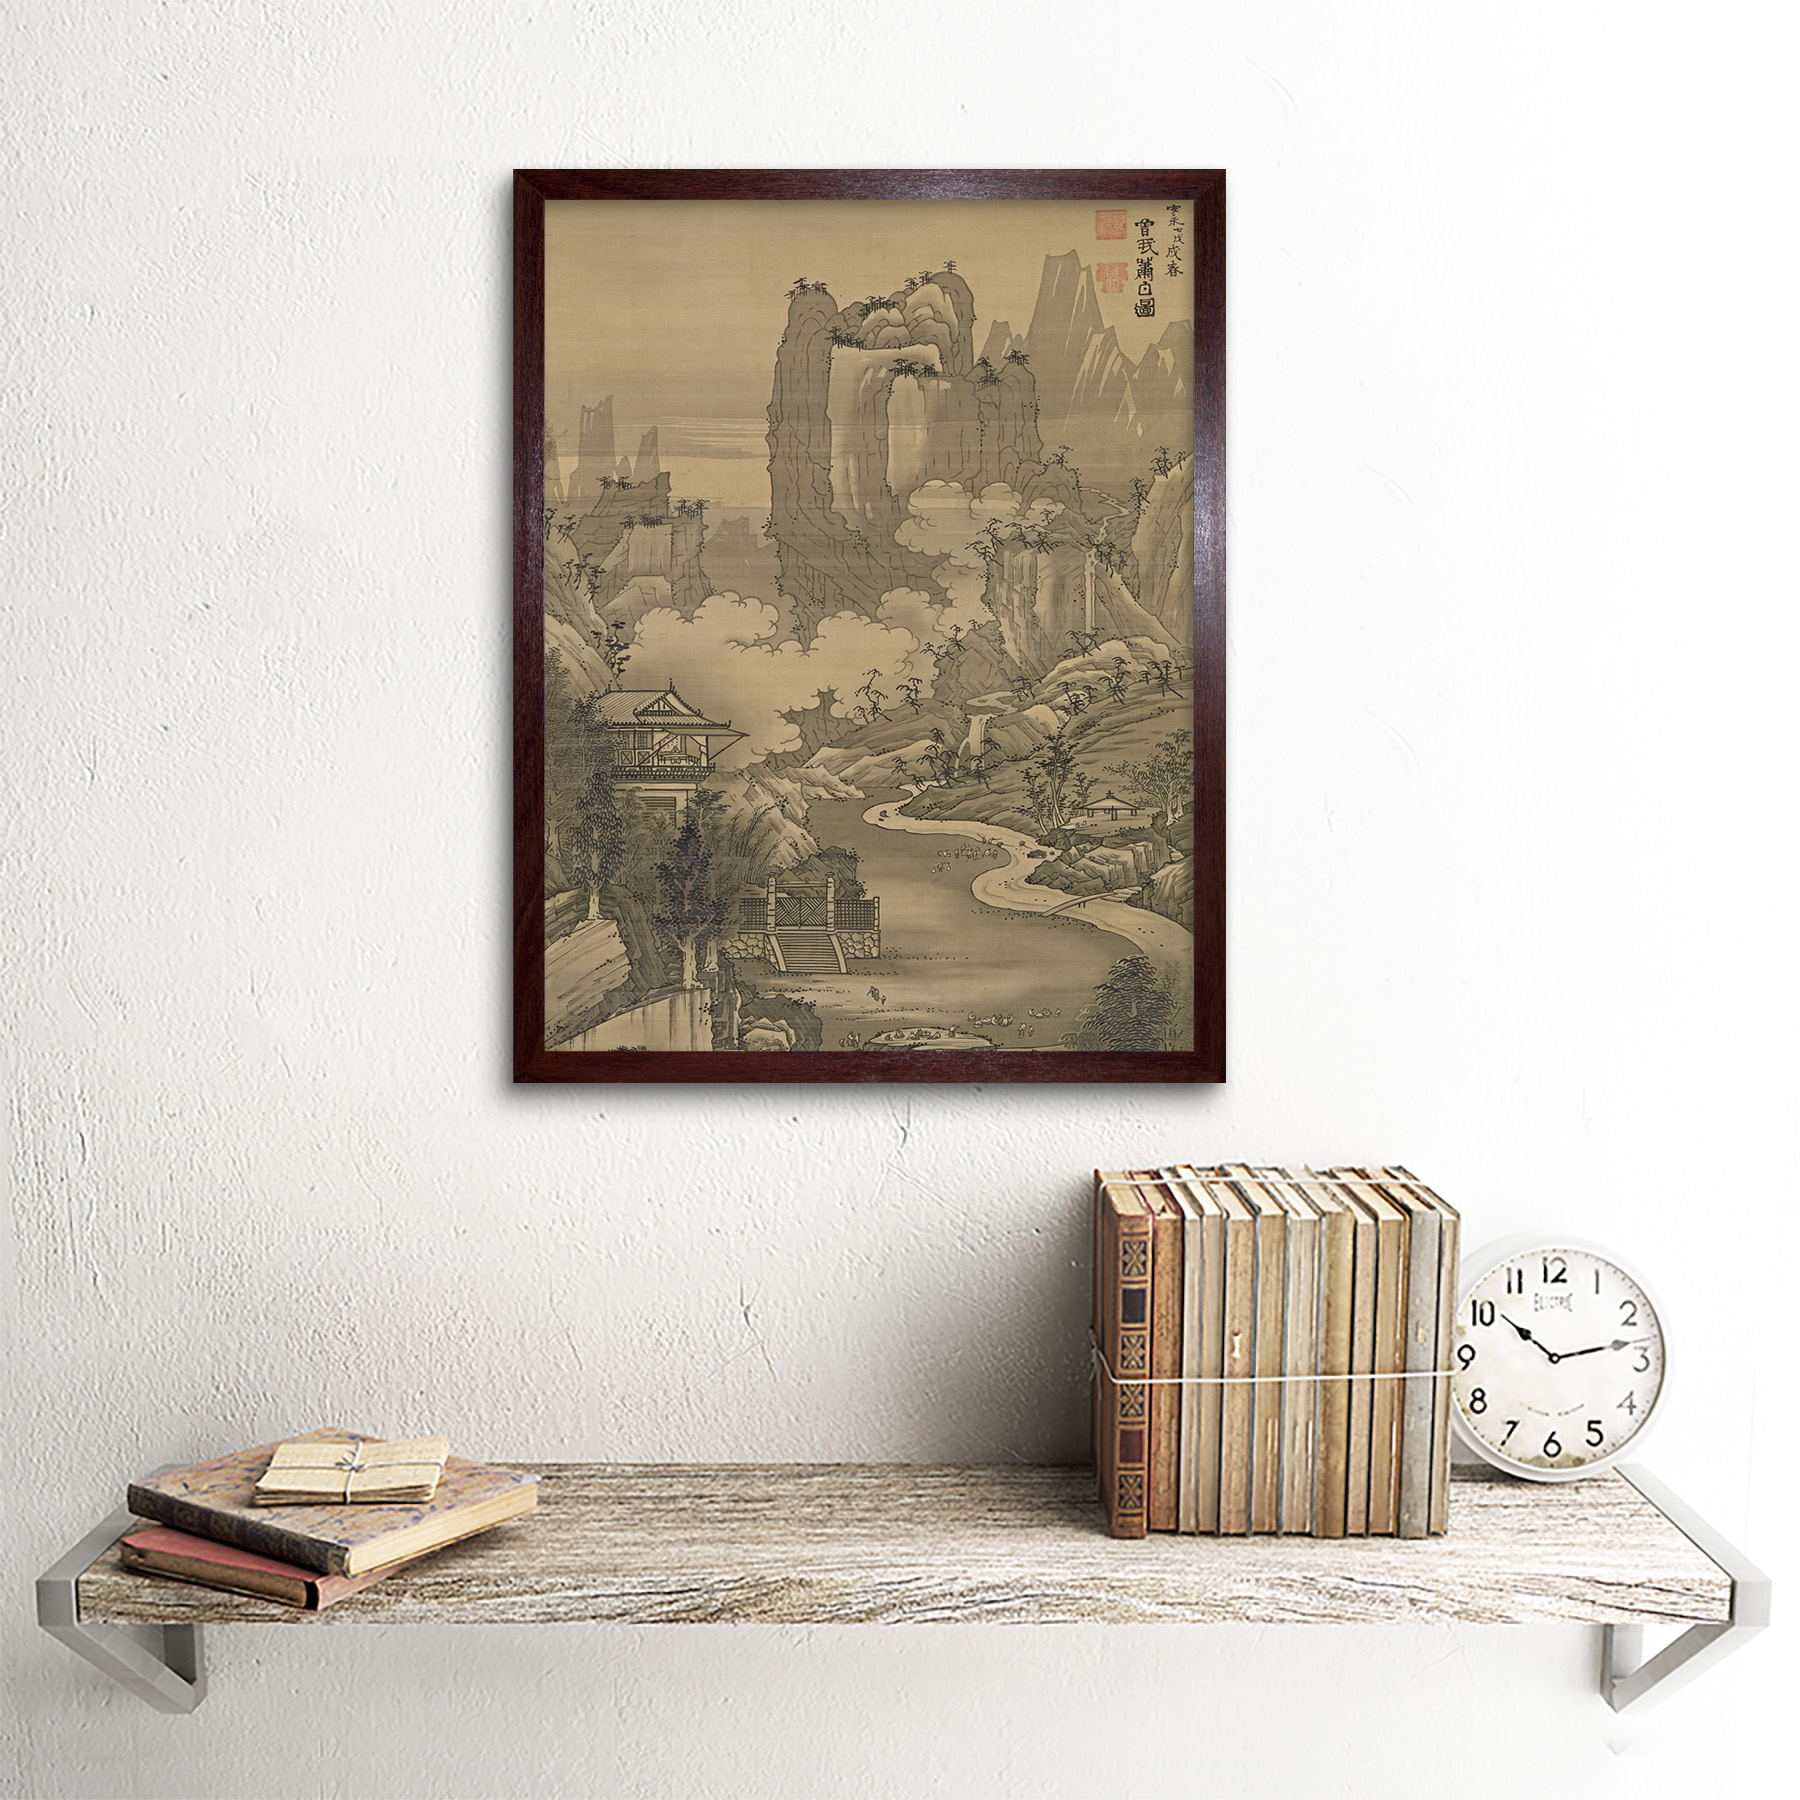 Shohaku-Orchid-Pavilion-Gathering-Screen-Painting-Wall-Art-Print-Framed-12x16 thumbnail 8